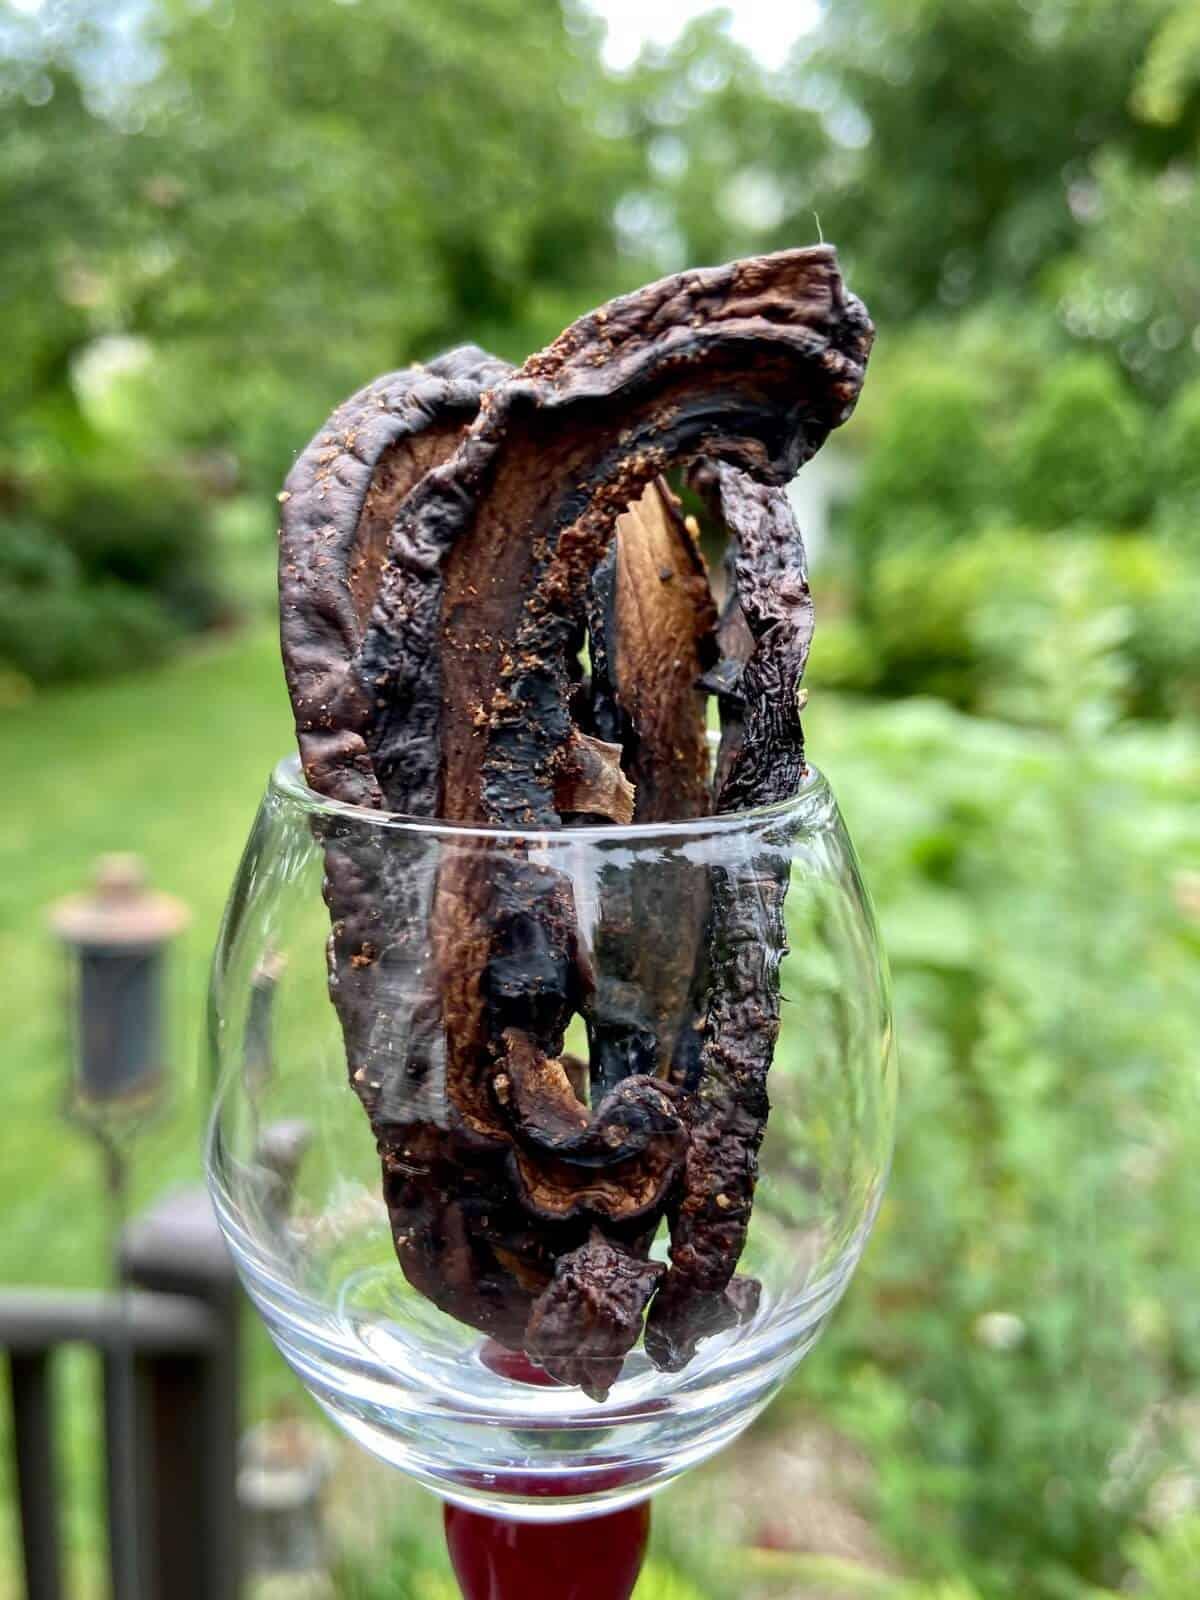 Mushroom Jerky Recipe - Portobello Mushroom Jerky (Photo by Erich Boenzli)